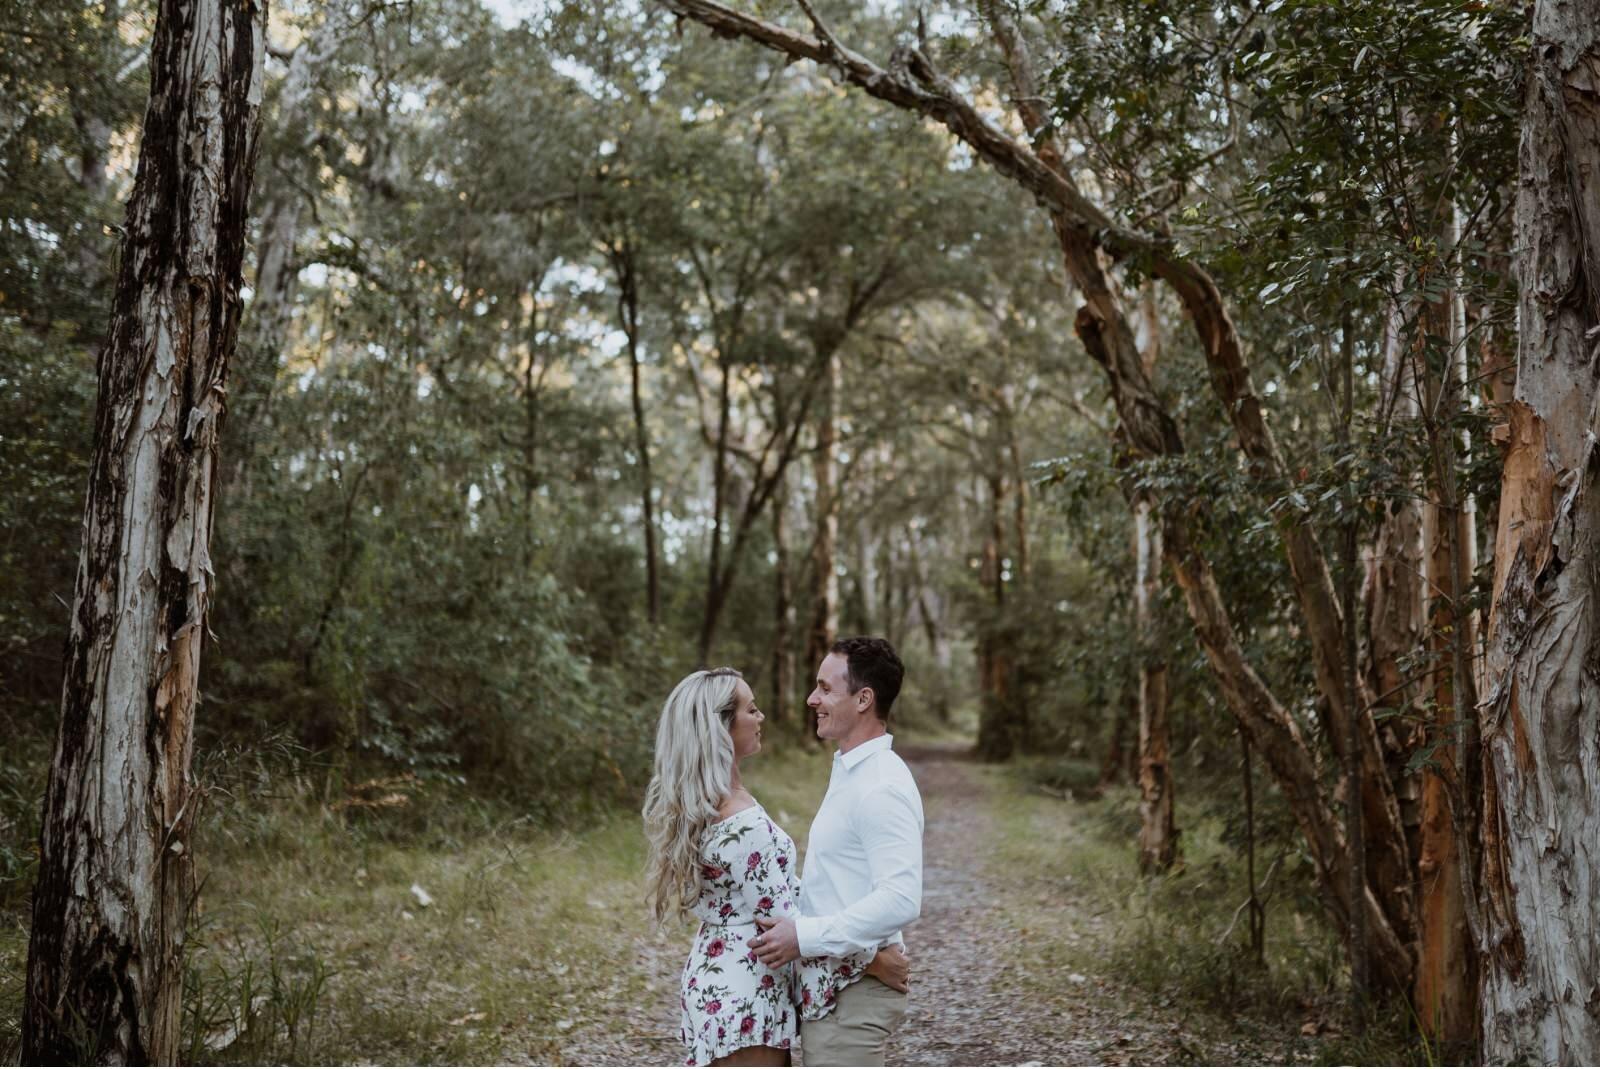 newcastle-wedding-photographer-dudley-engagement-shoot-9.jpg